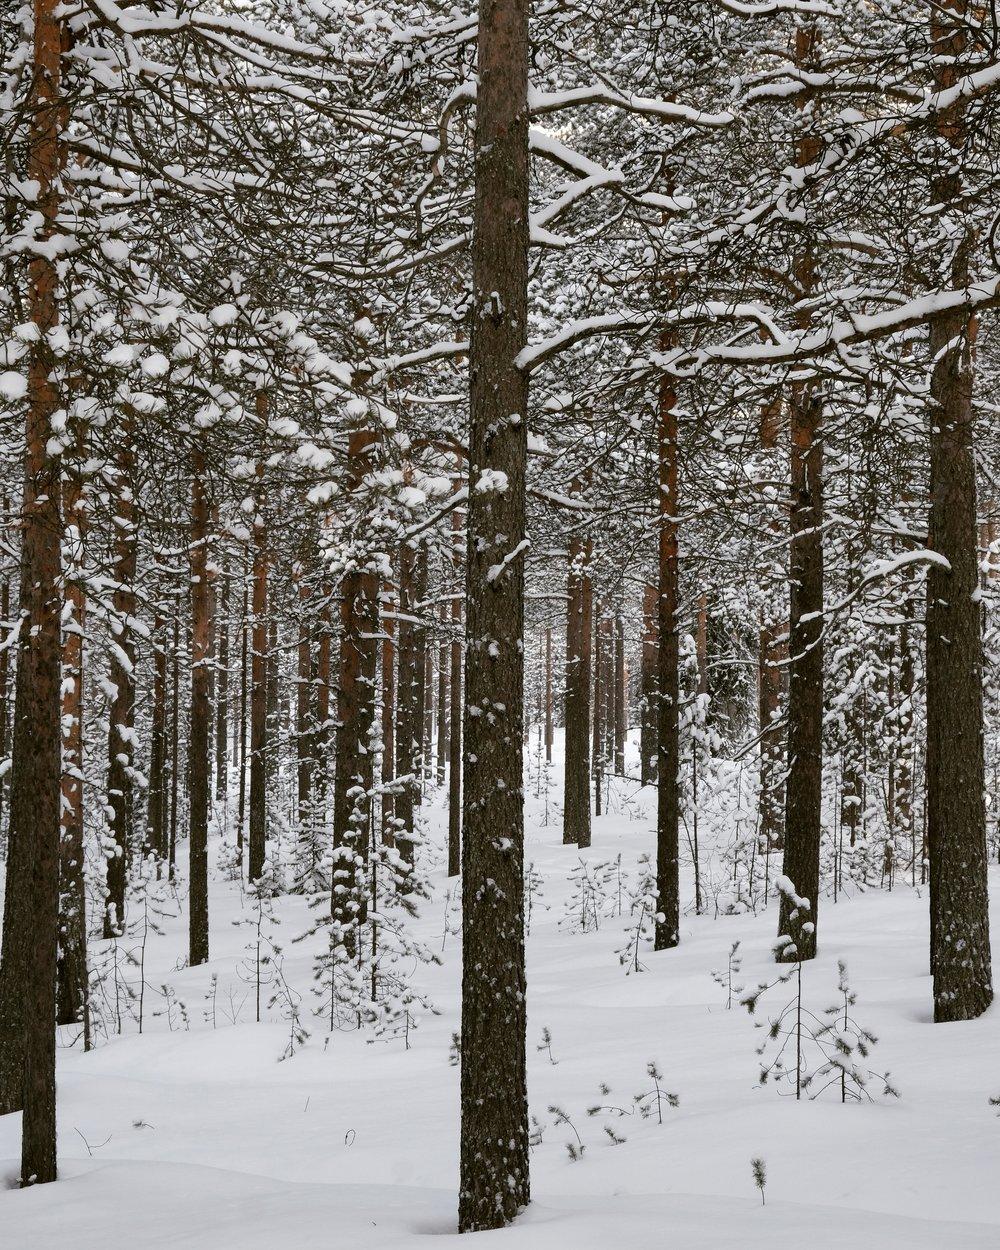 a-walk-in-the-forest-rucksack-magazine-4